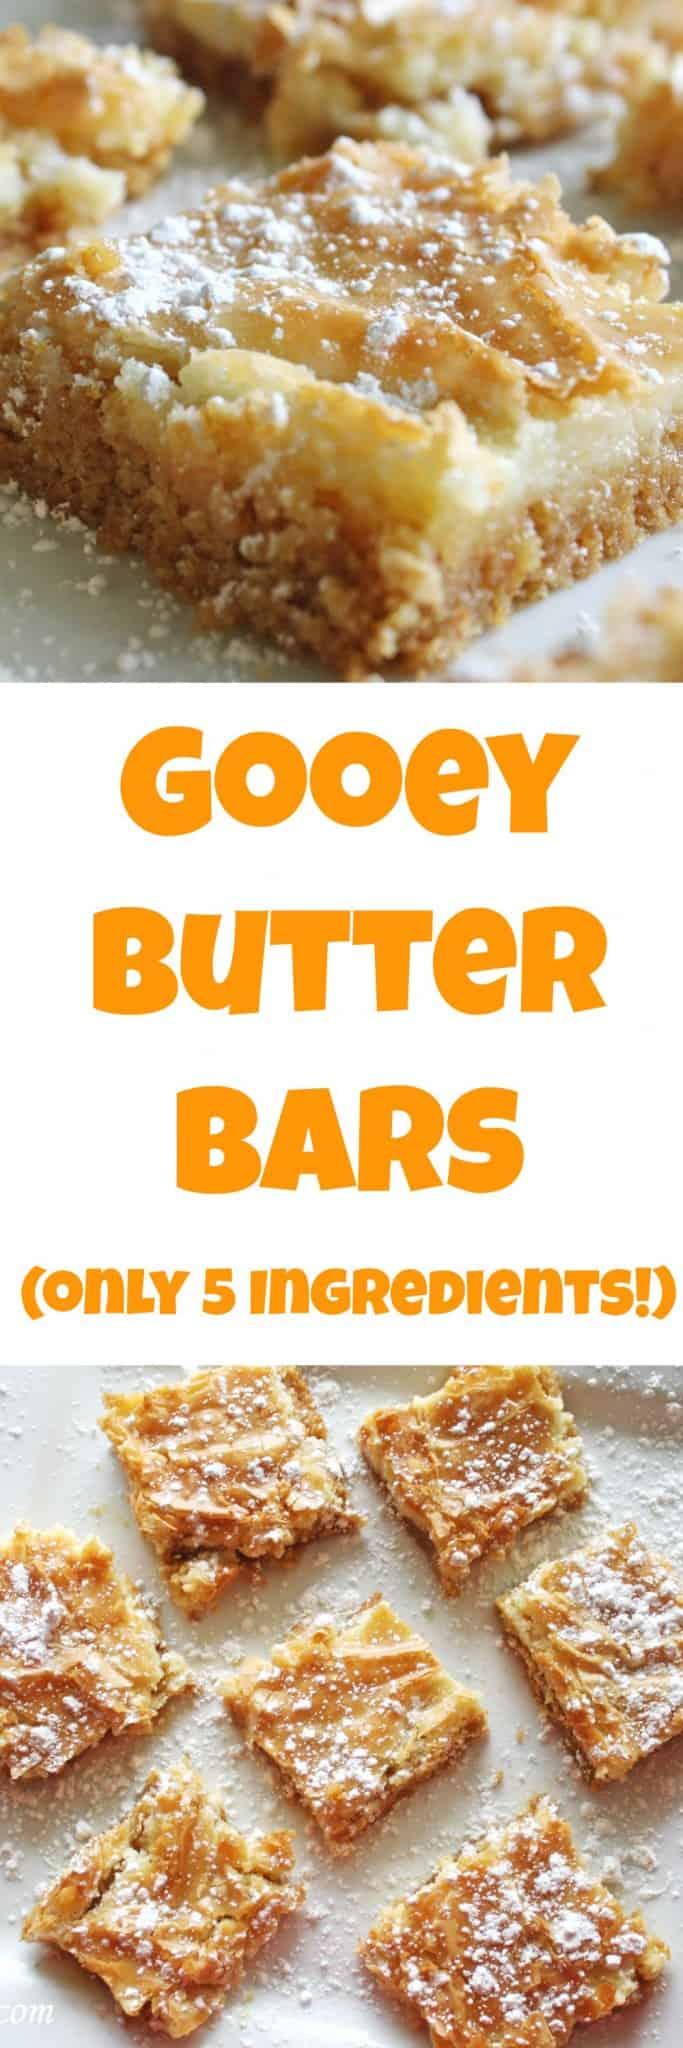 Gooey Butter Bars by Rose Bakes